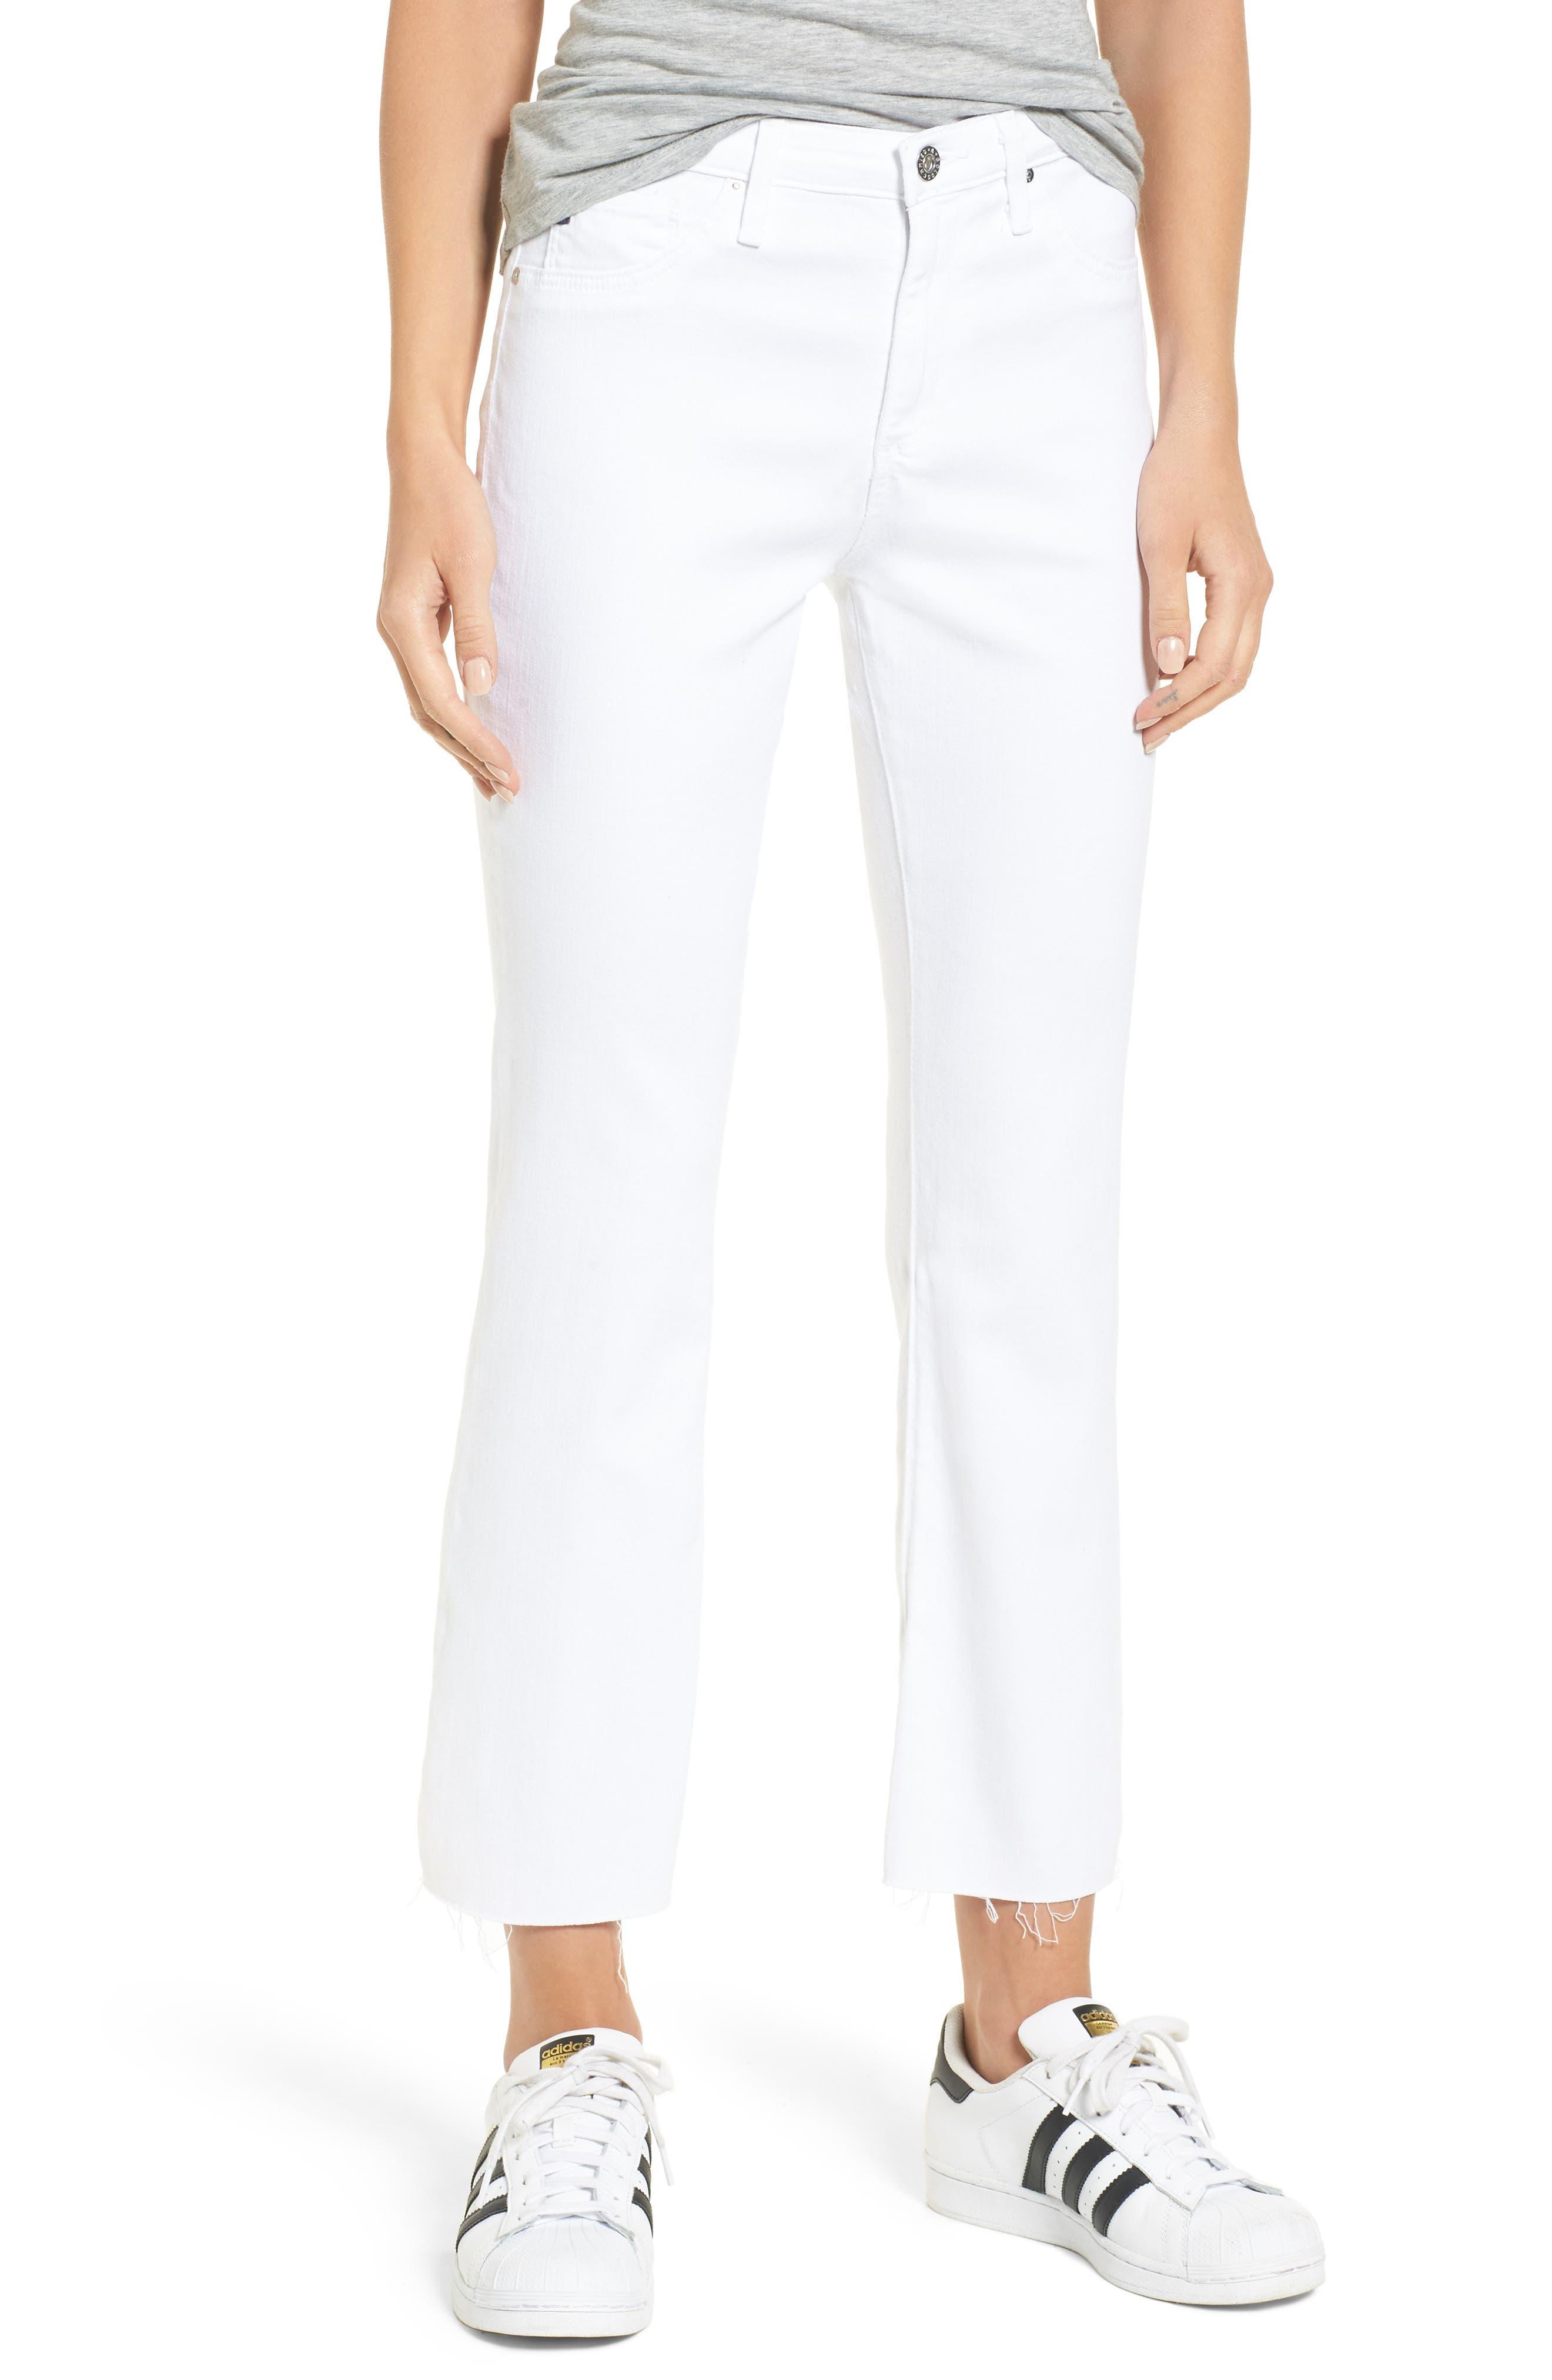 Jodi High Waist Crop Jeans,                             Main thumbnail 1, color,                             110